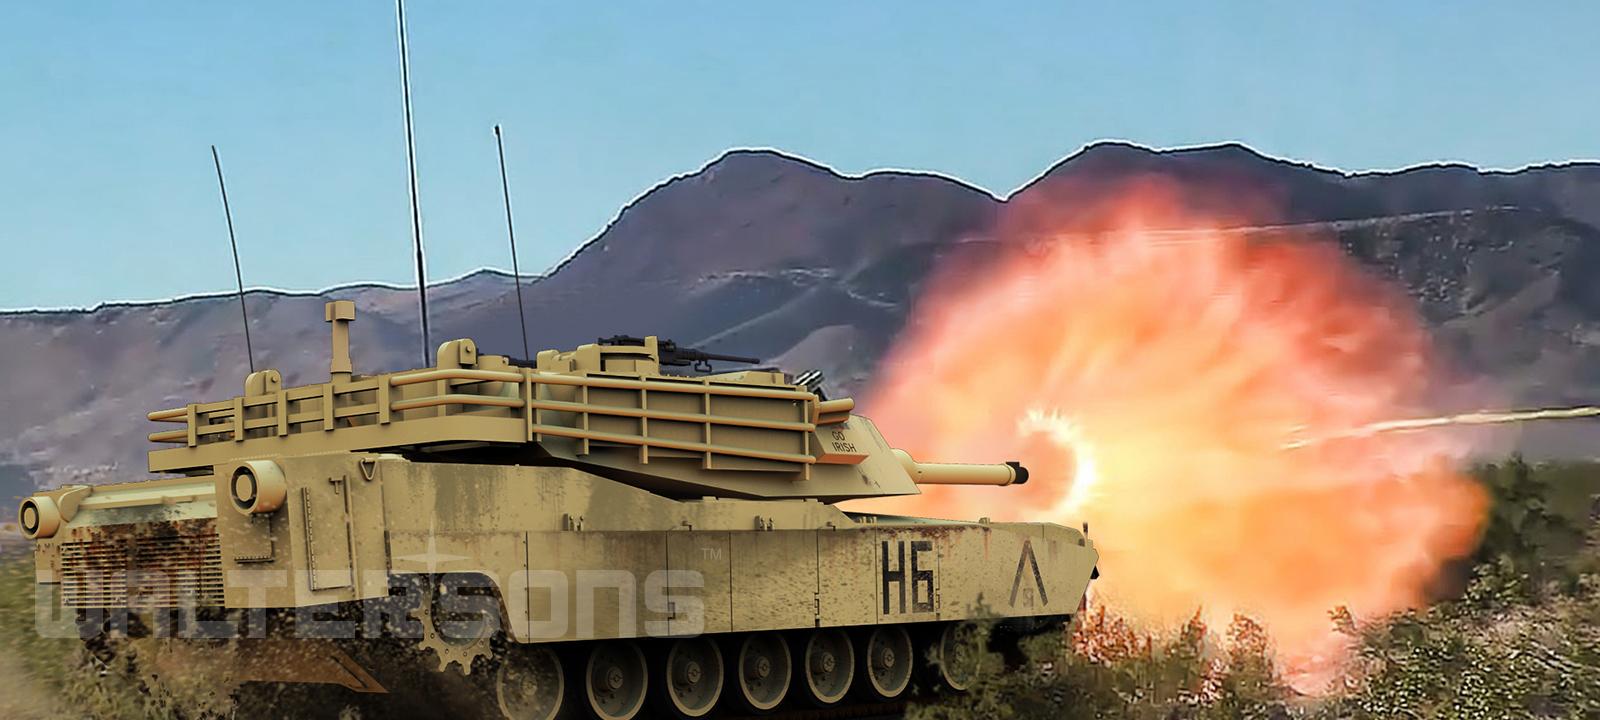 RC tank Waltersons US M1A1 Abrams Desert Yellow